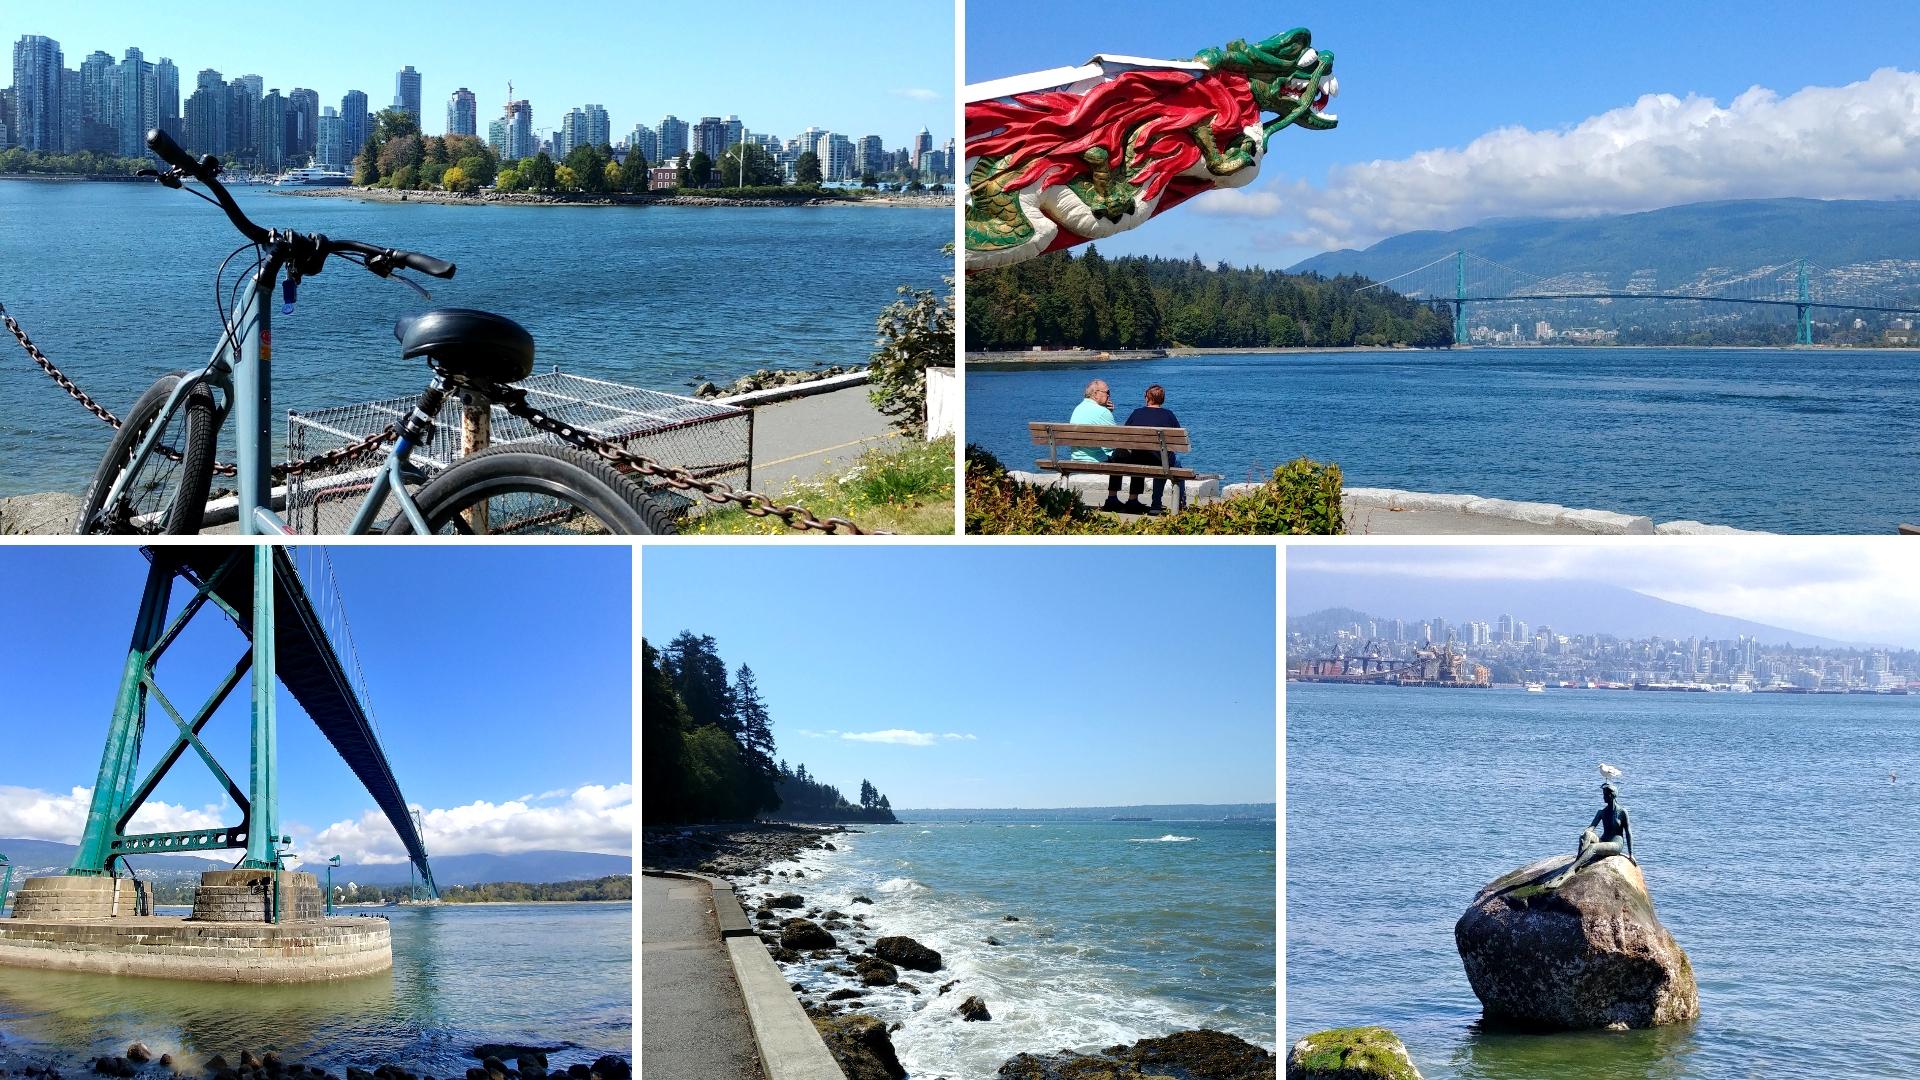 Vancouver stanley park balade velos blog voyage colombie-britannique canada arpenter le chemin